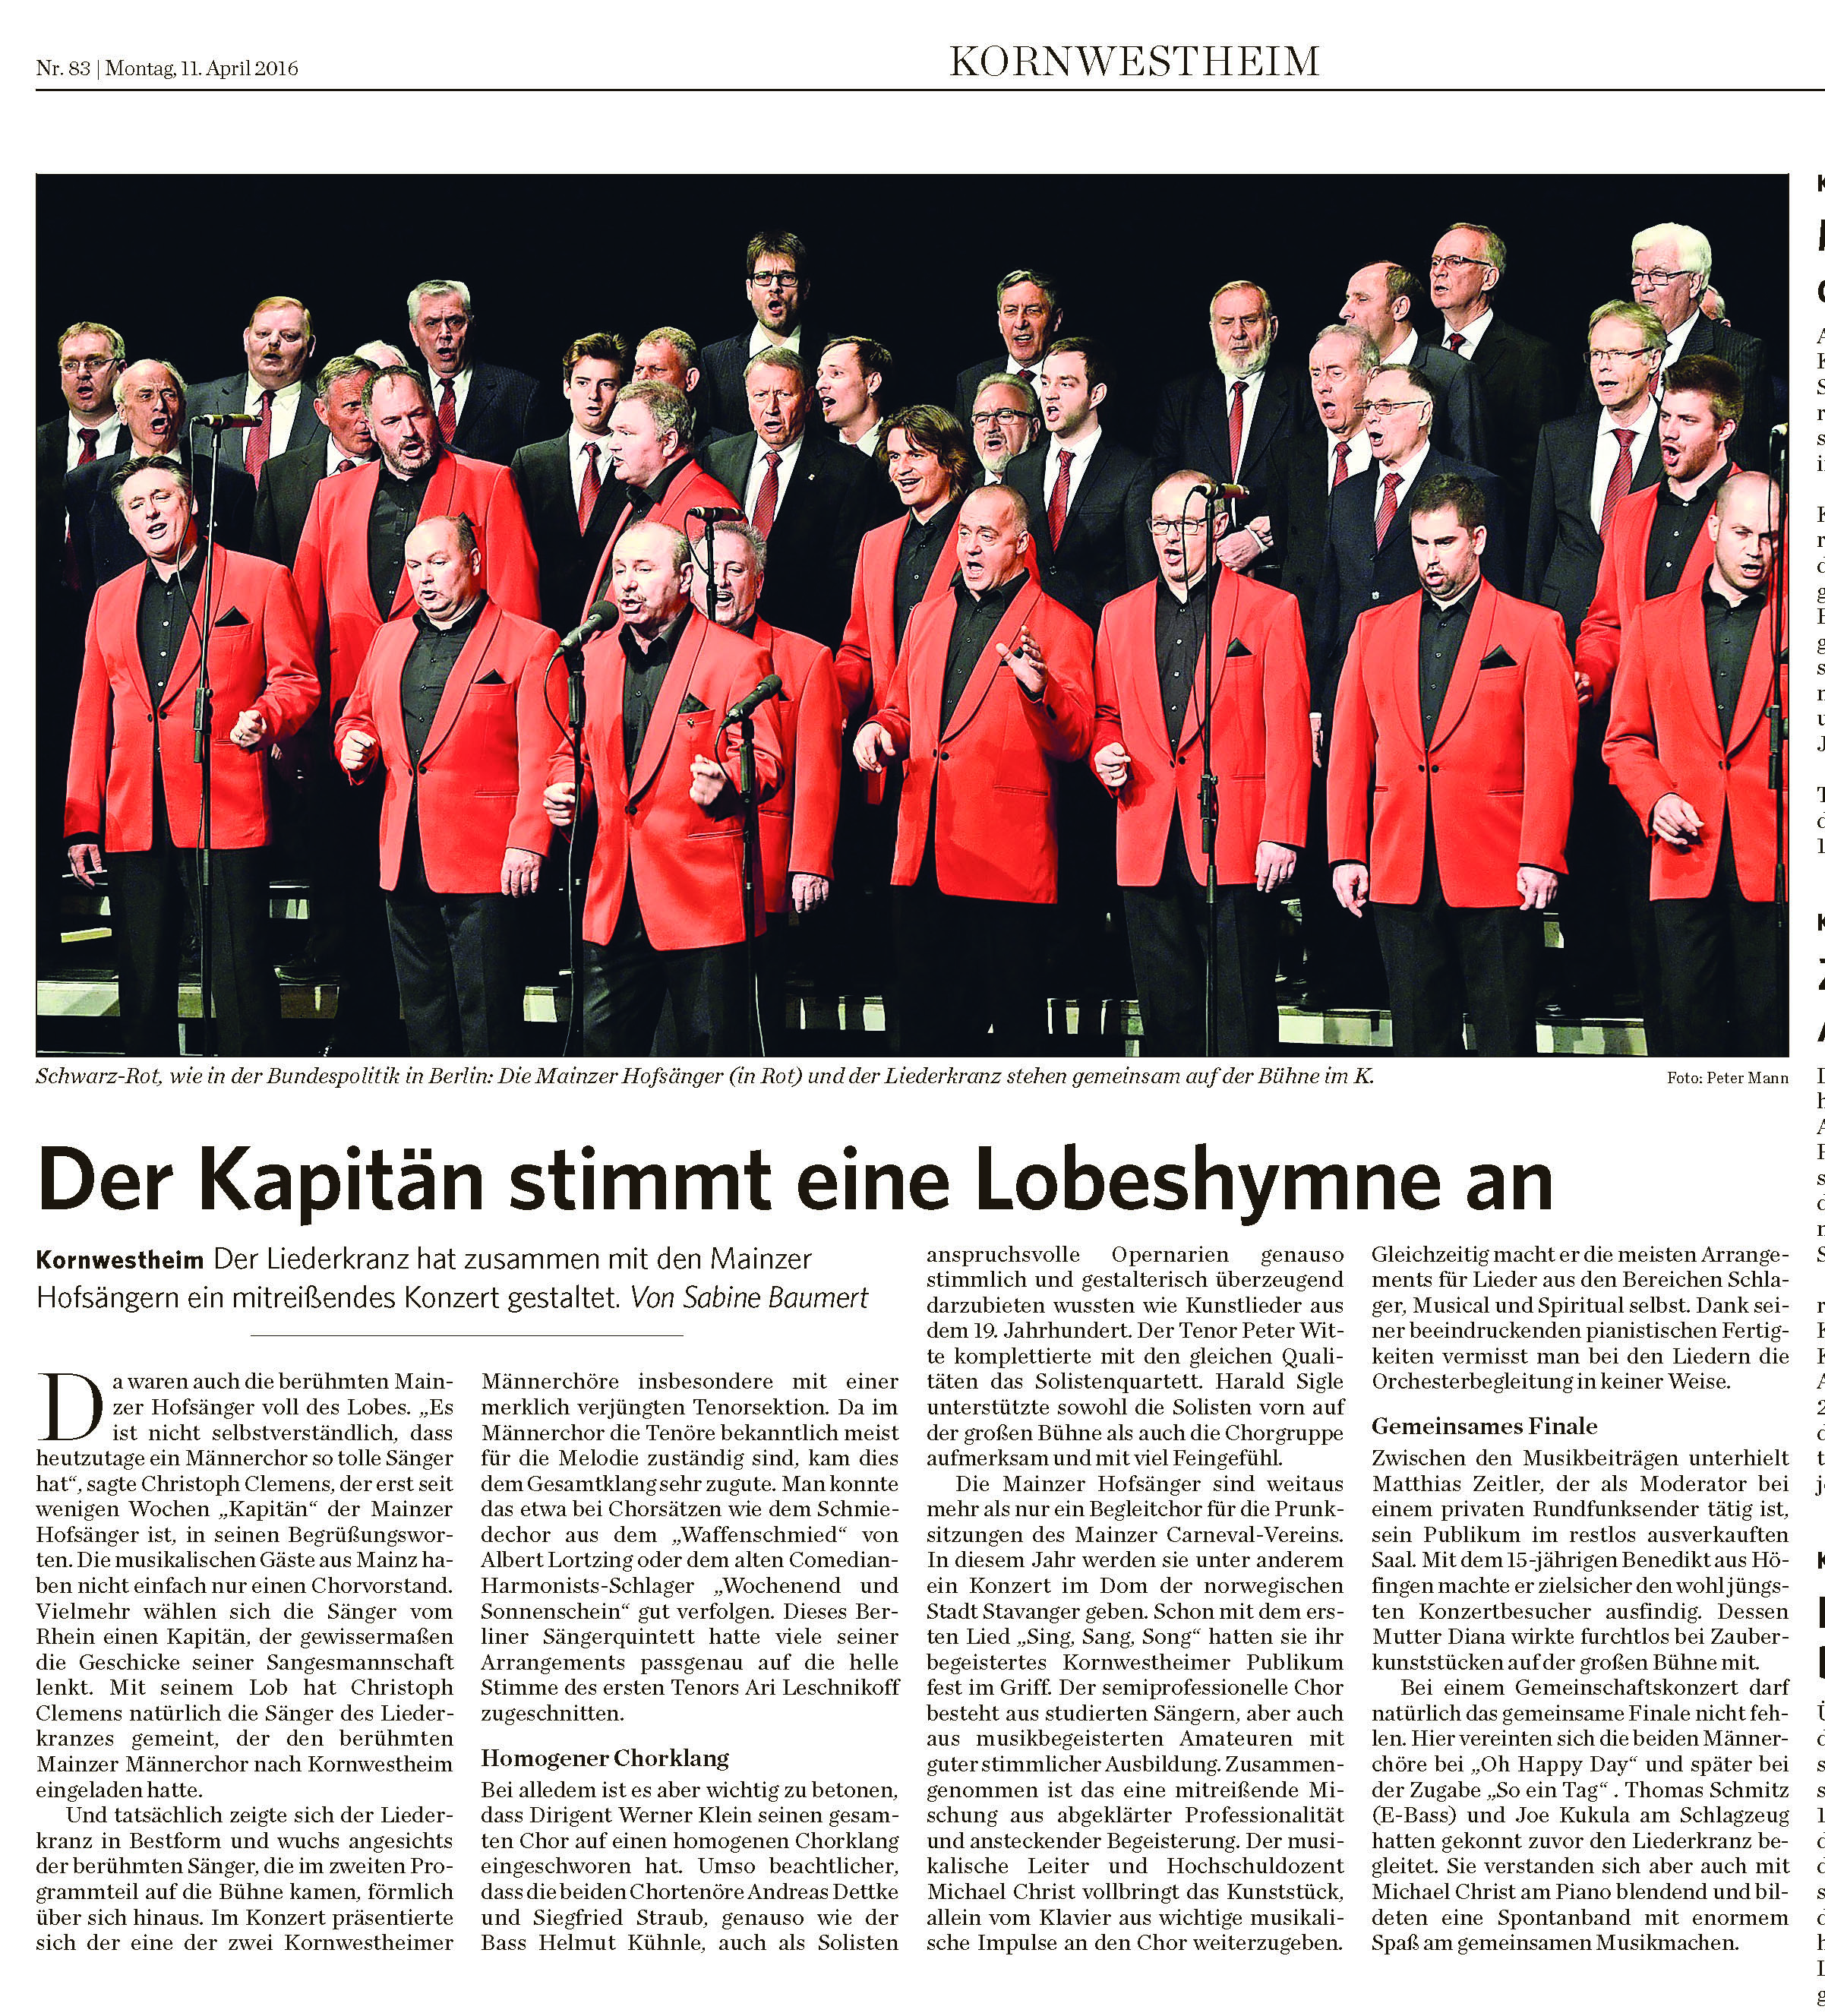 Konzertkritik_LK_Kornwestheim-2016